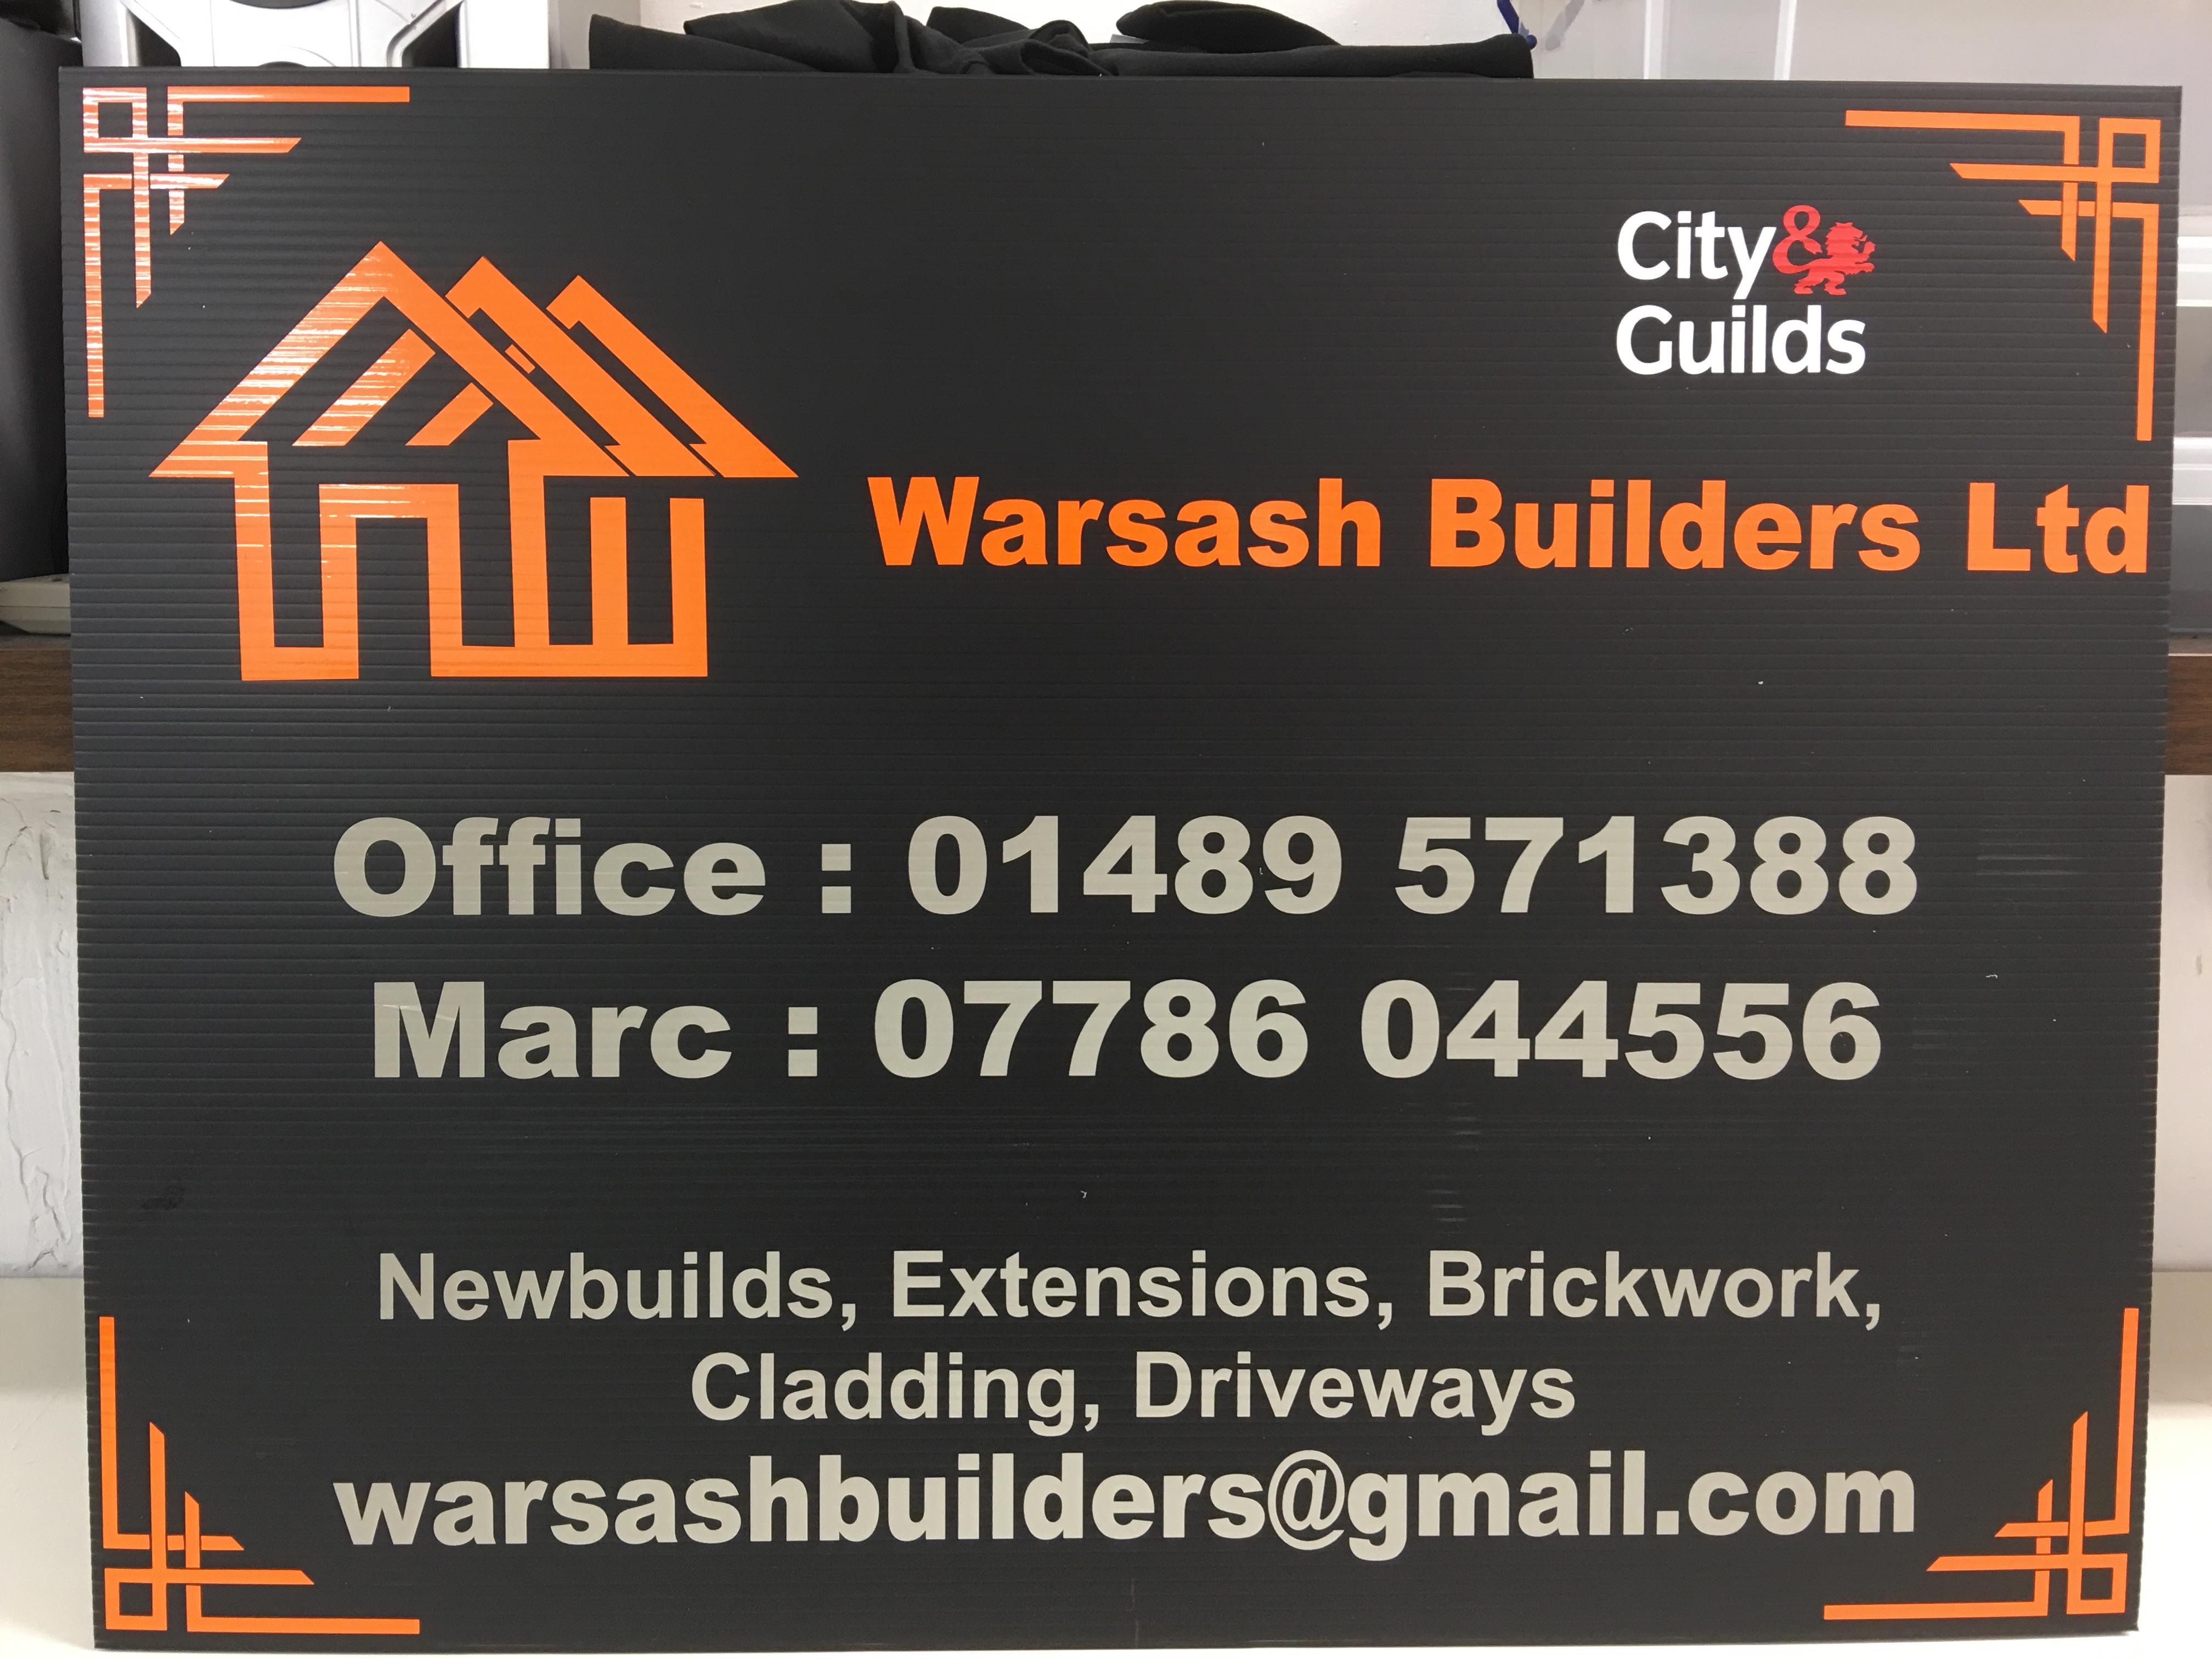 Warsash Builders - Board